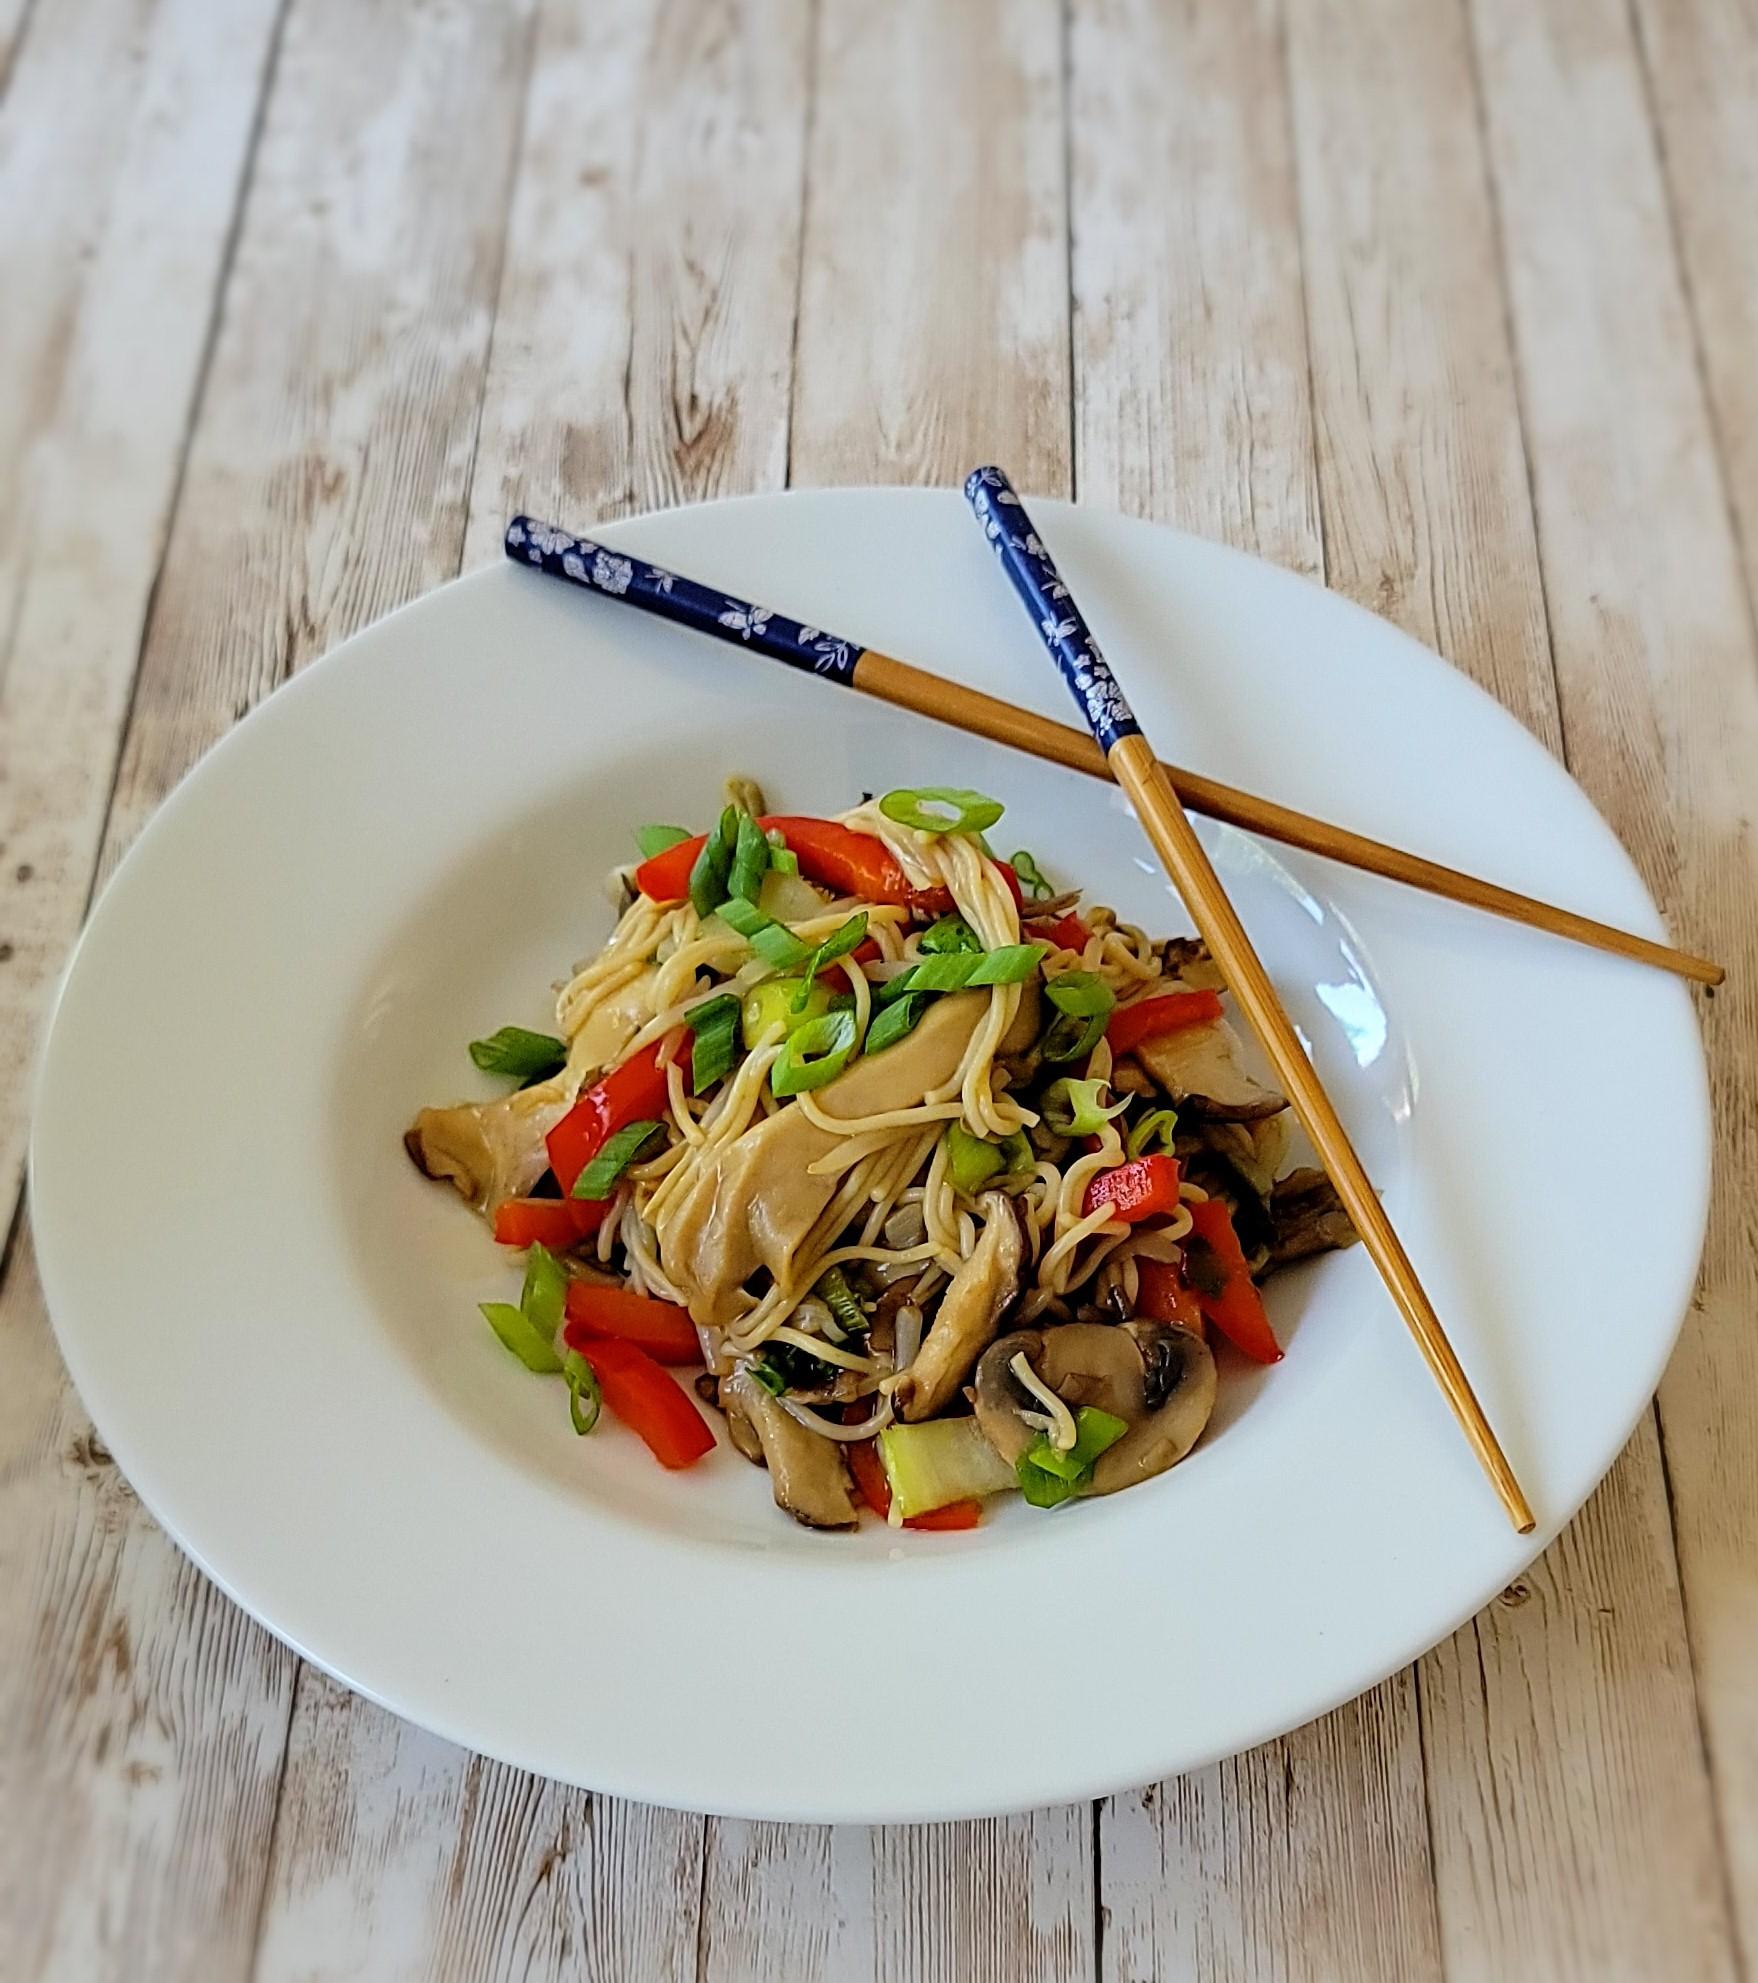 Flavorful Exotic Mushroom Ramen has assorted mushrooms, colorful vegetables with teriyaki sauce and gluten free ramen.